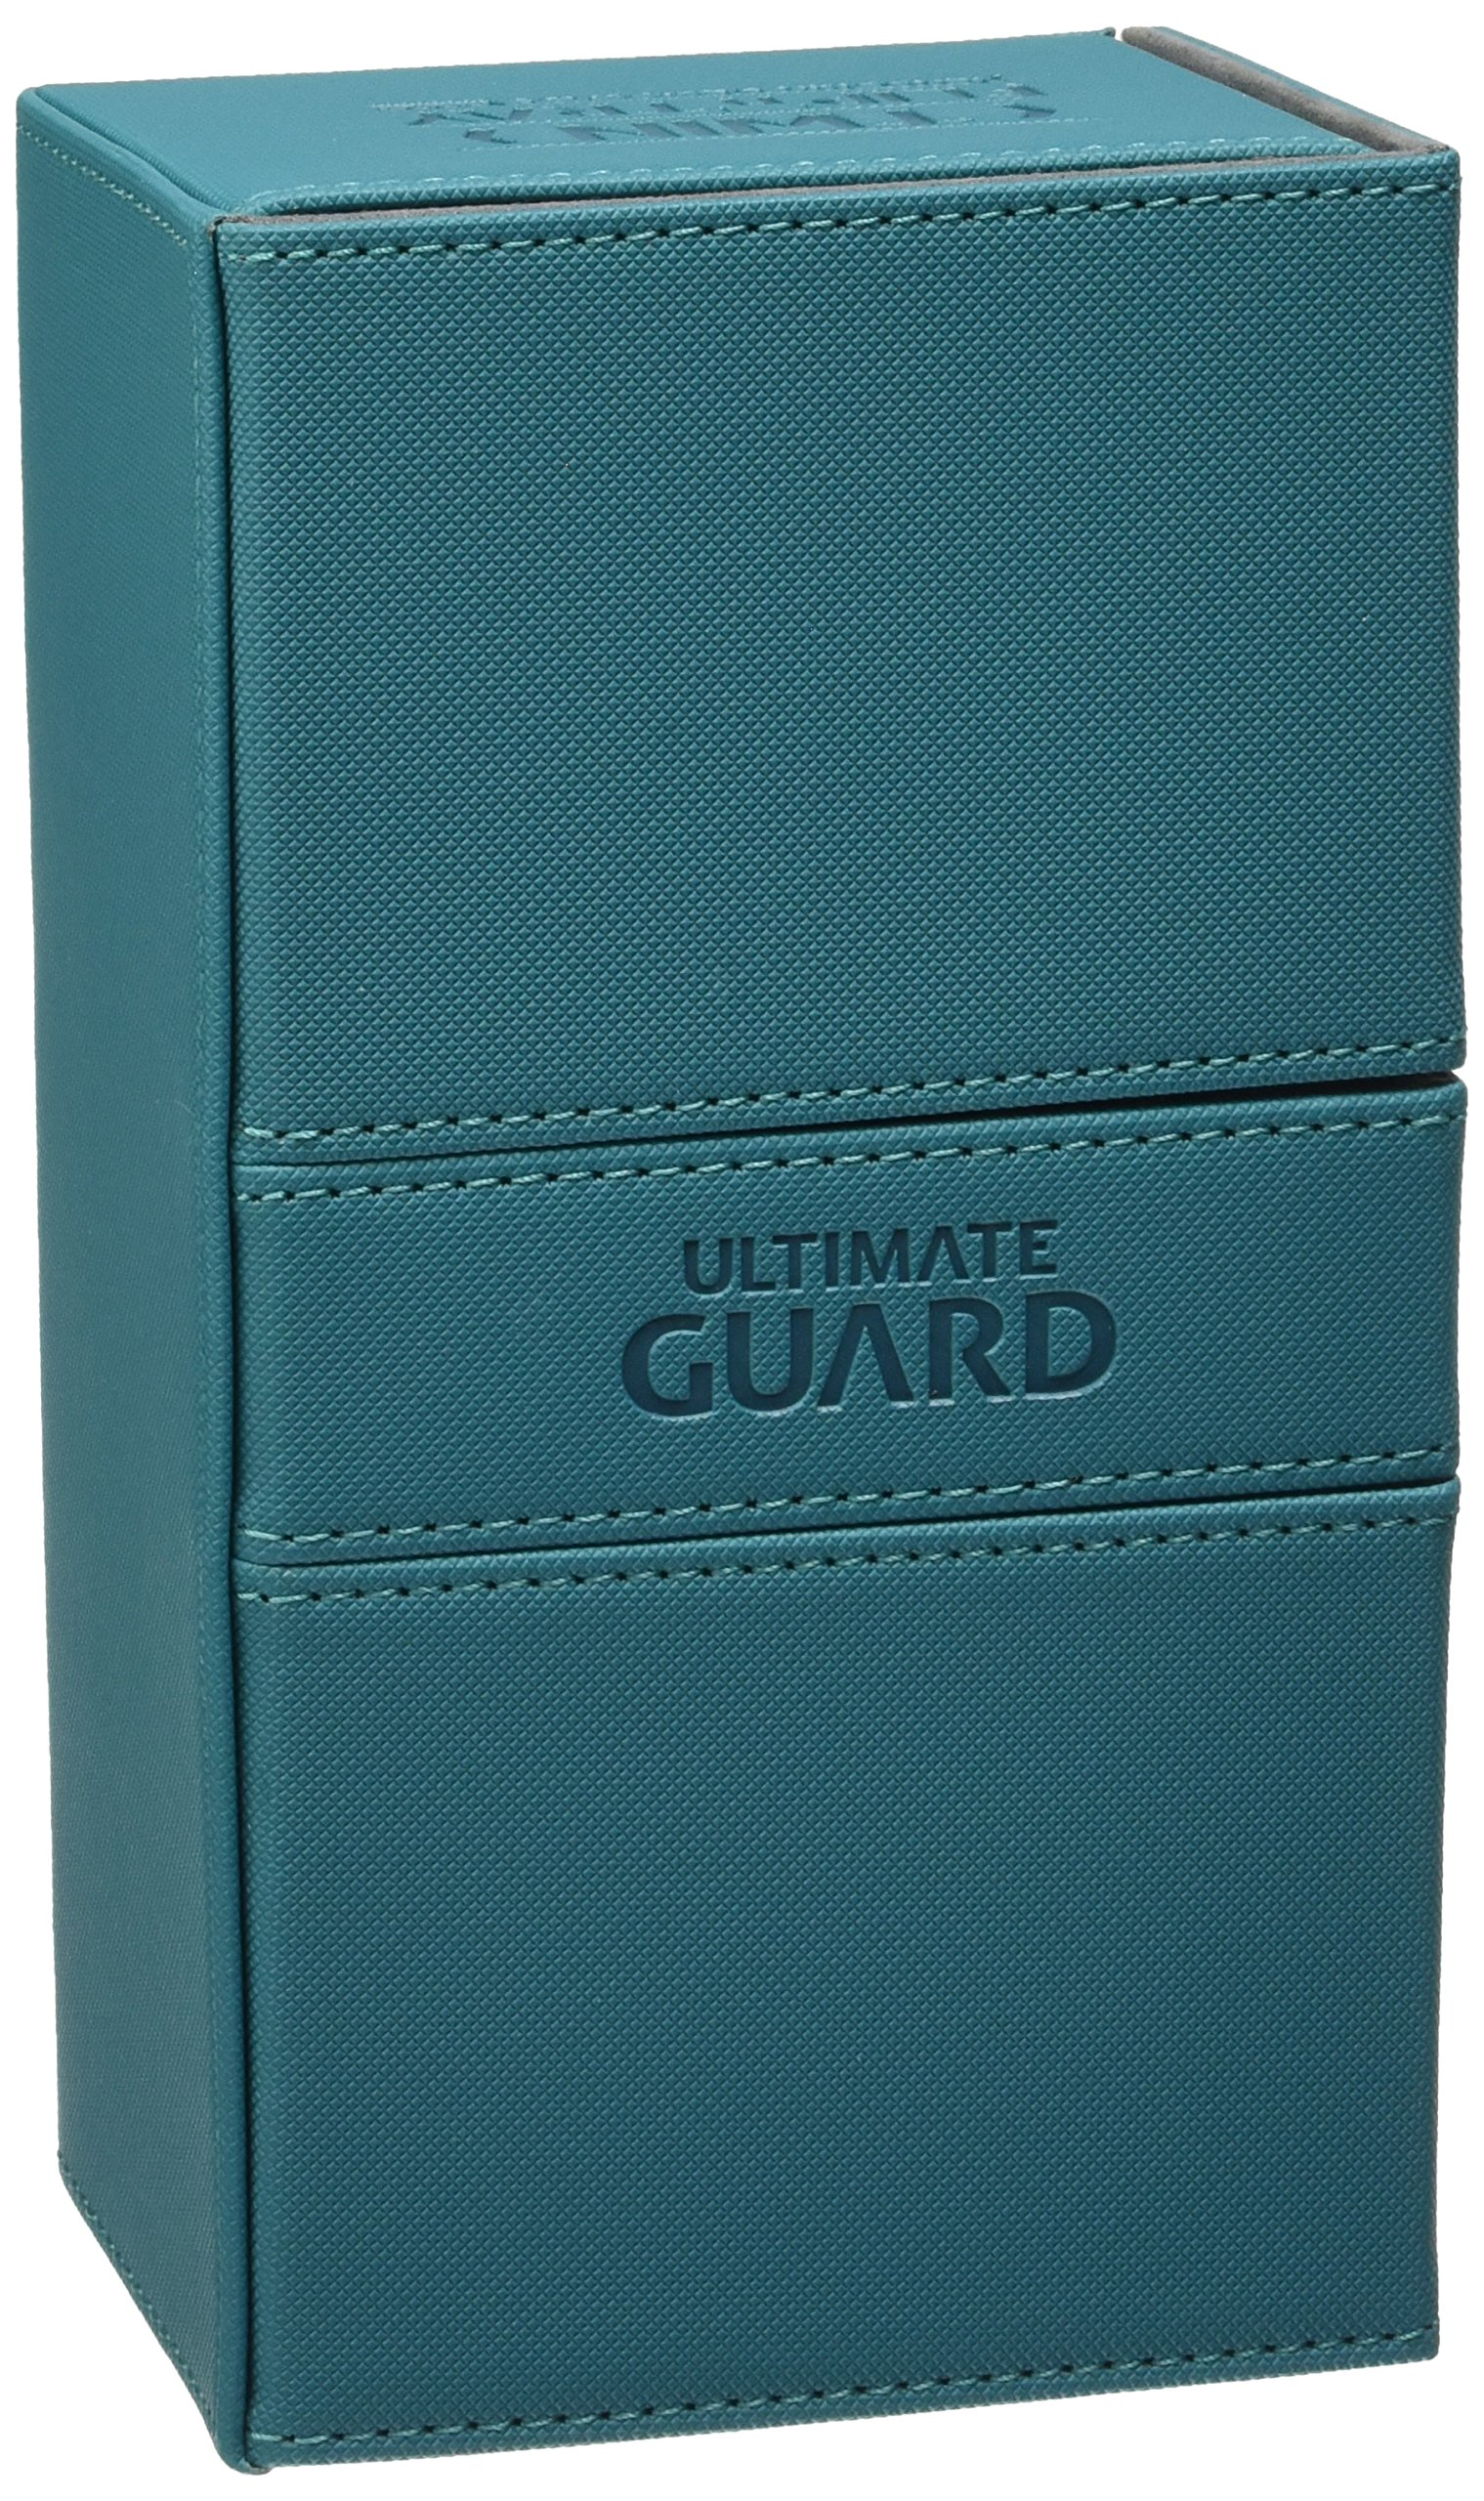 Ultimate Guard Deck Box Twin Flip N Tray Xenoskin 200 Case, Petrol by Ultimate Guard